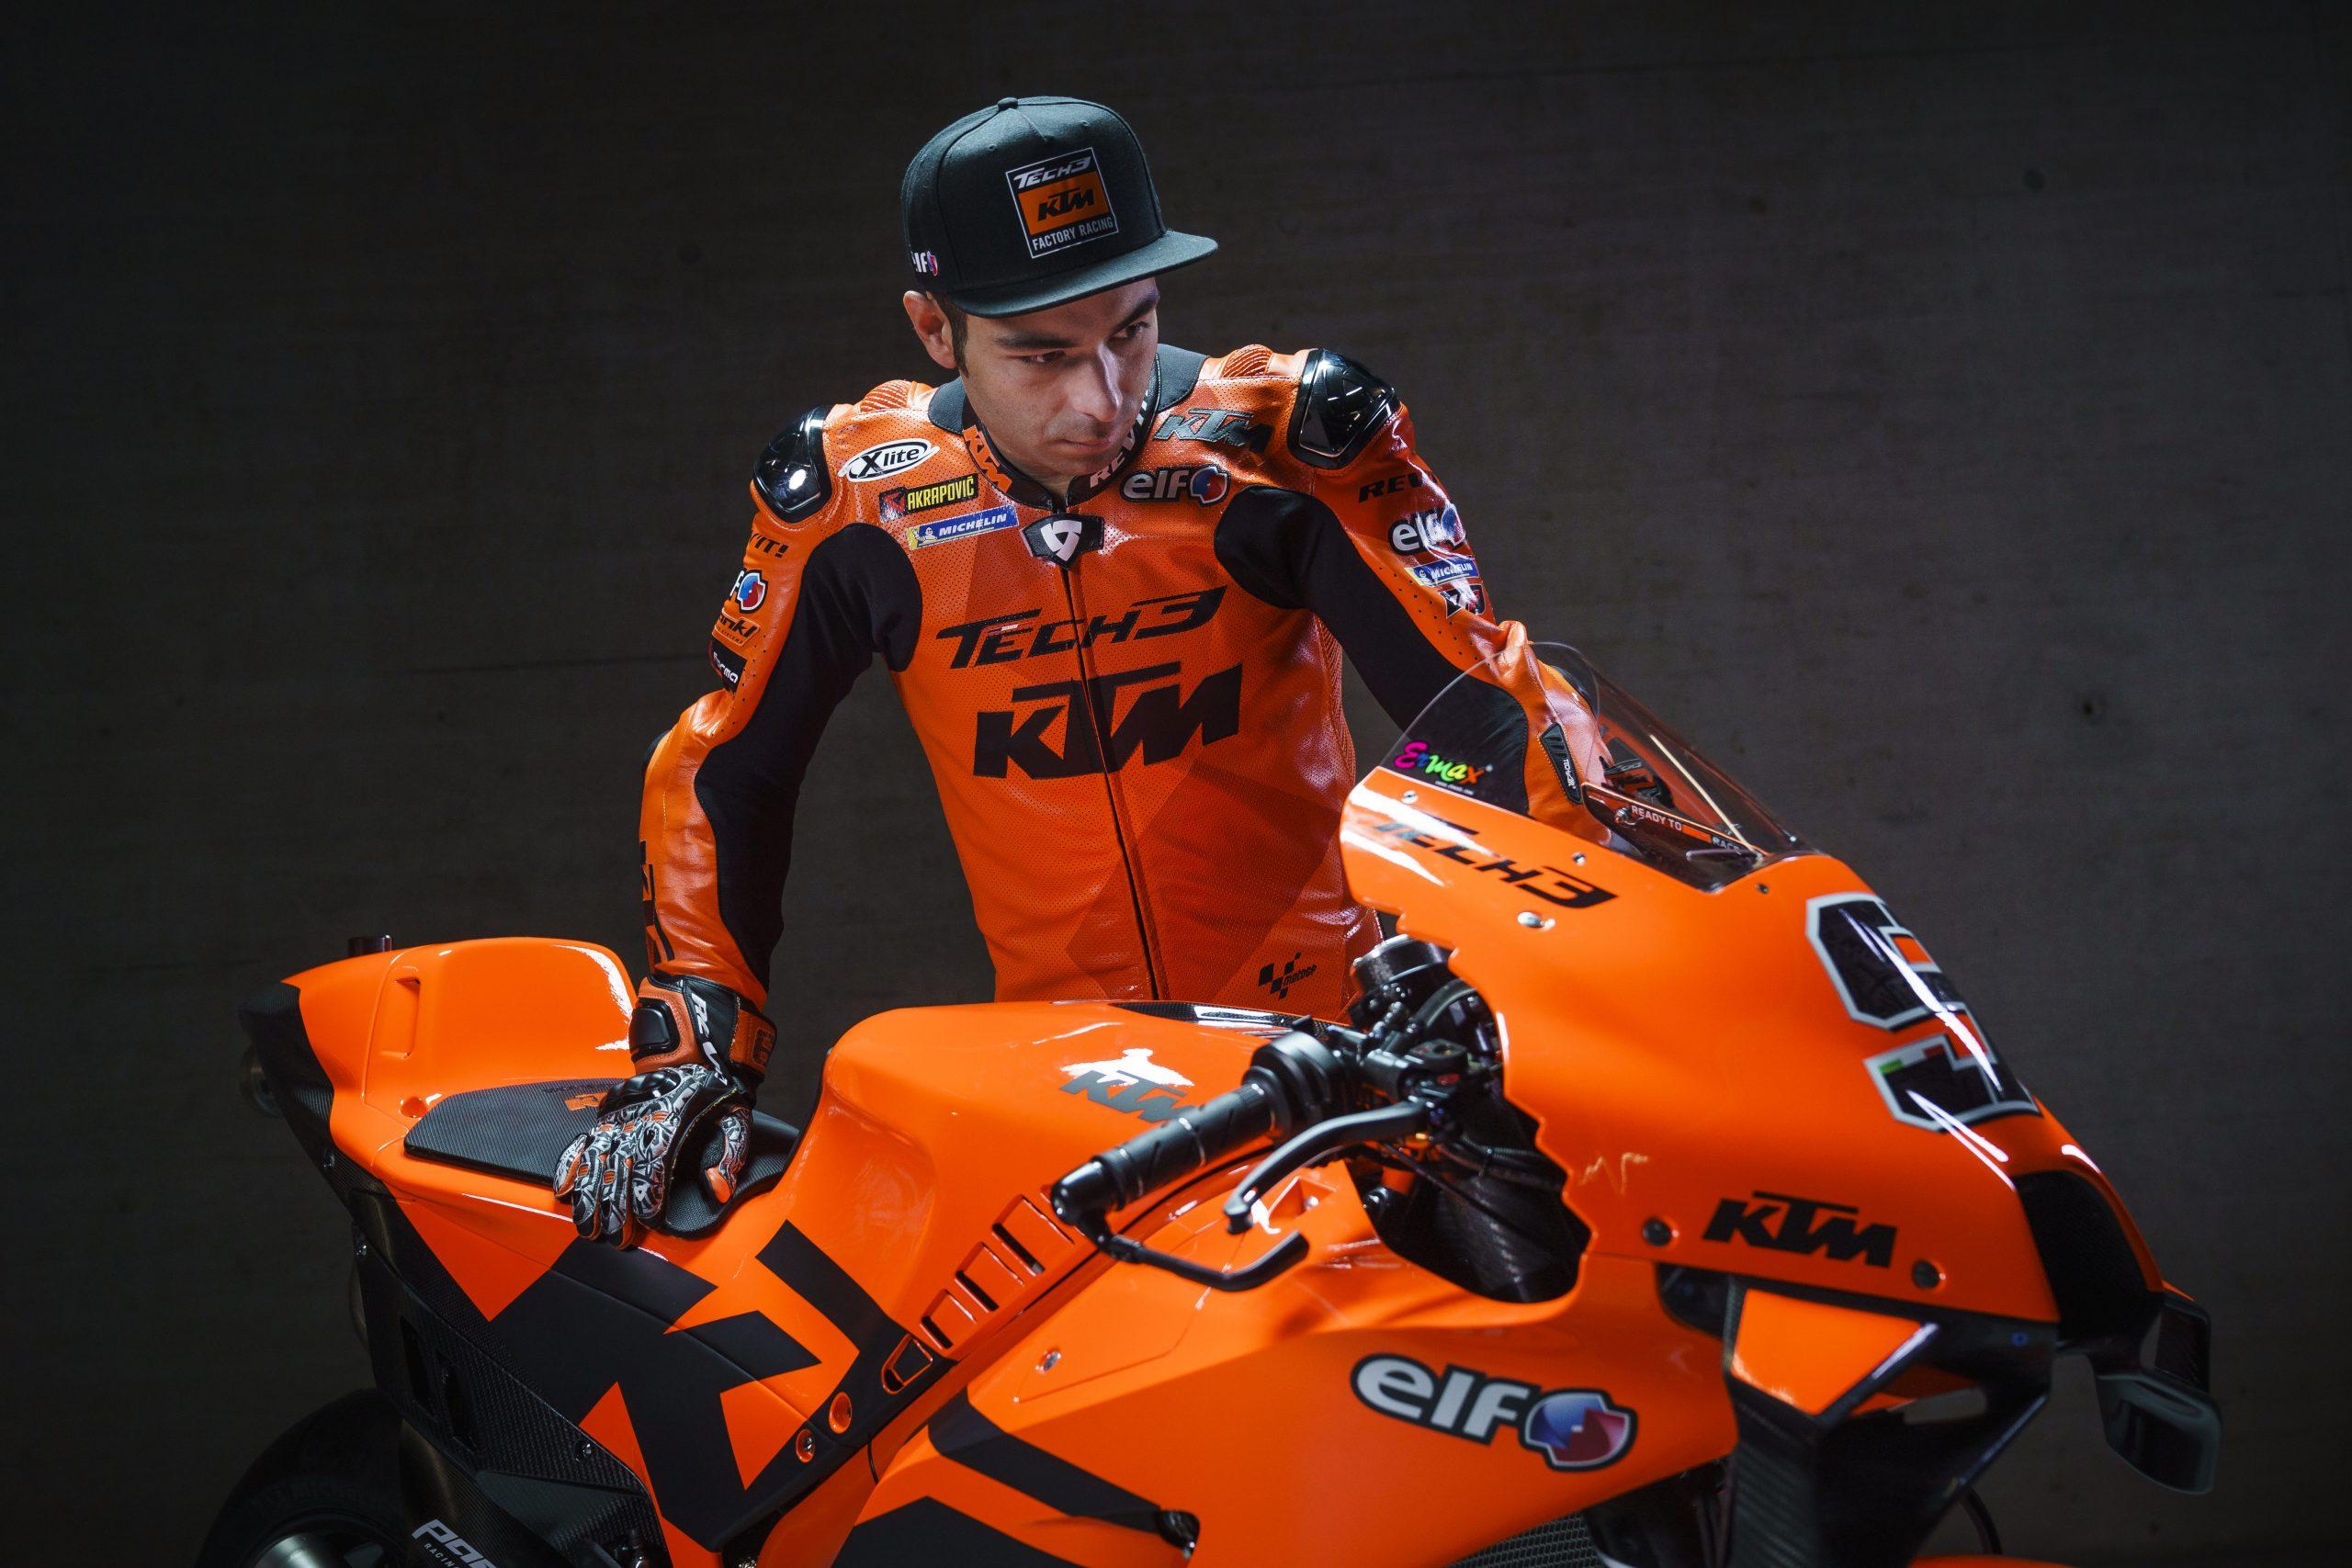 Danilo Petrucci zadebiutuje na KTM-ie